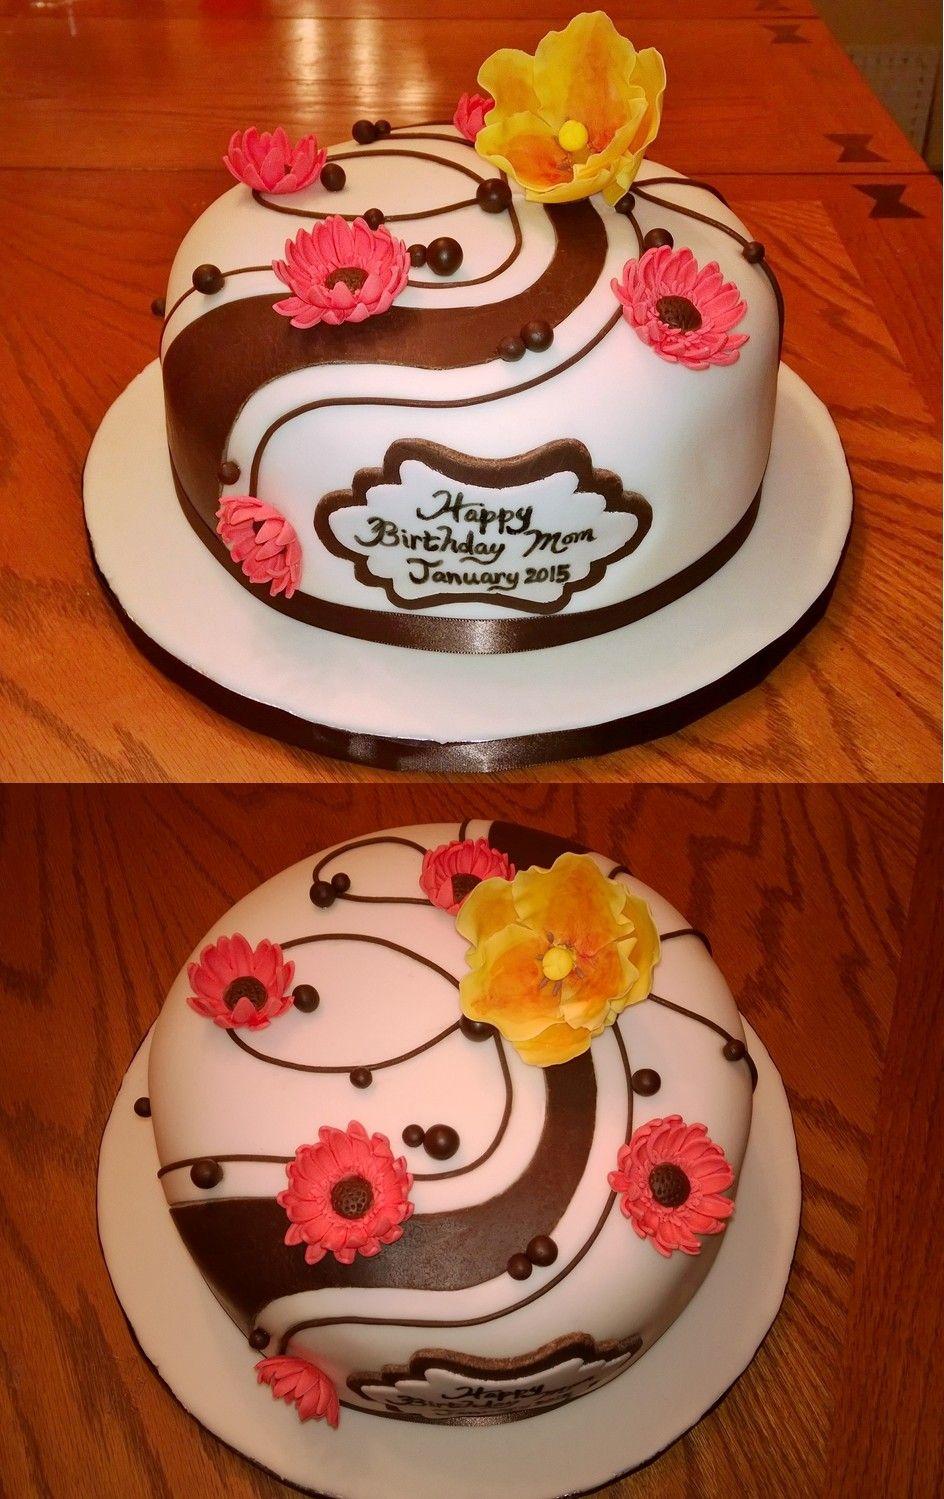 Elegant abstract cake design that my client found online